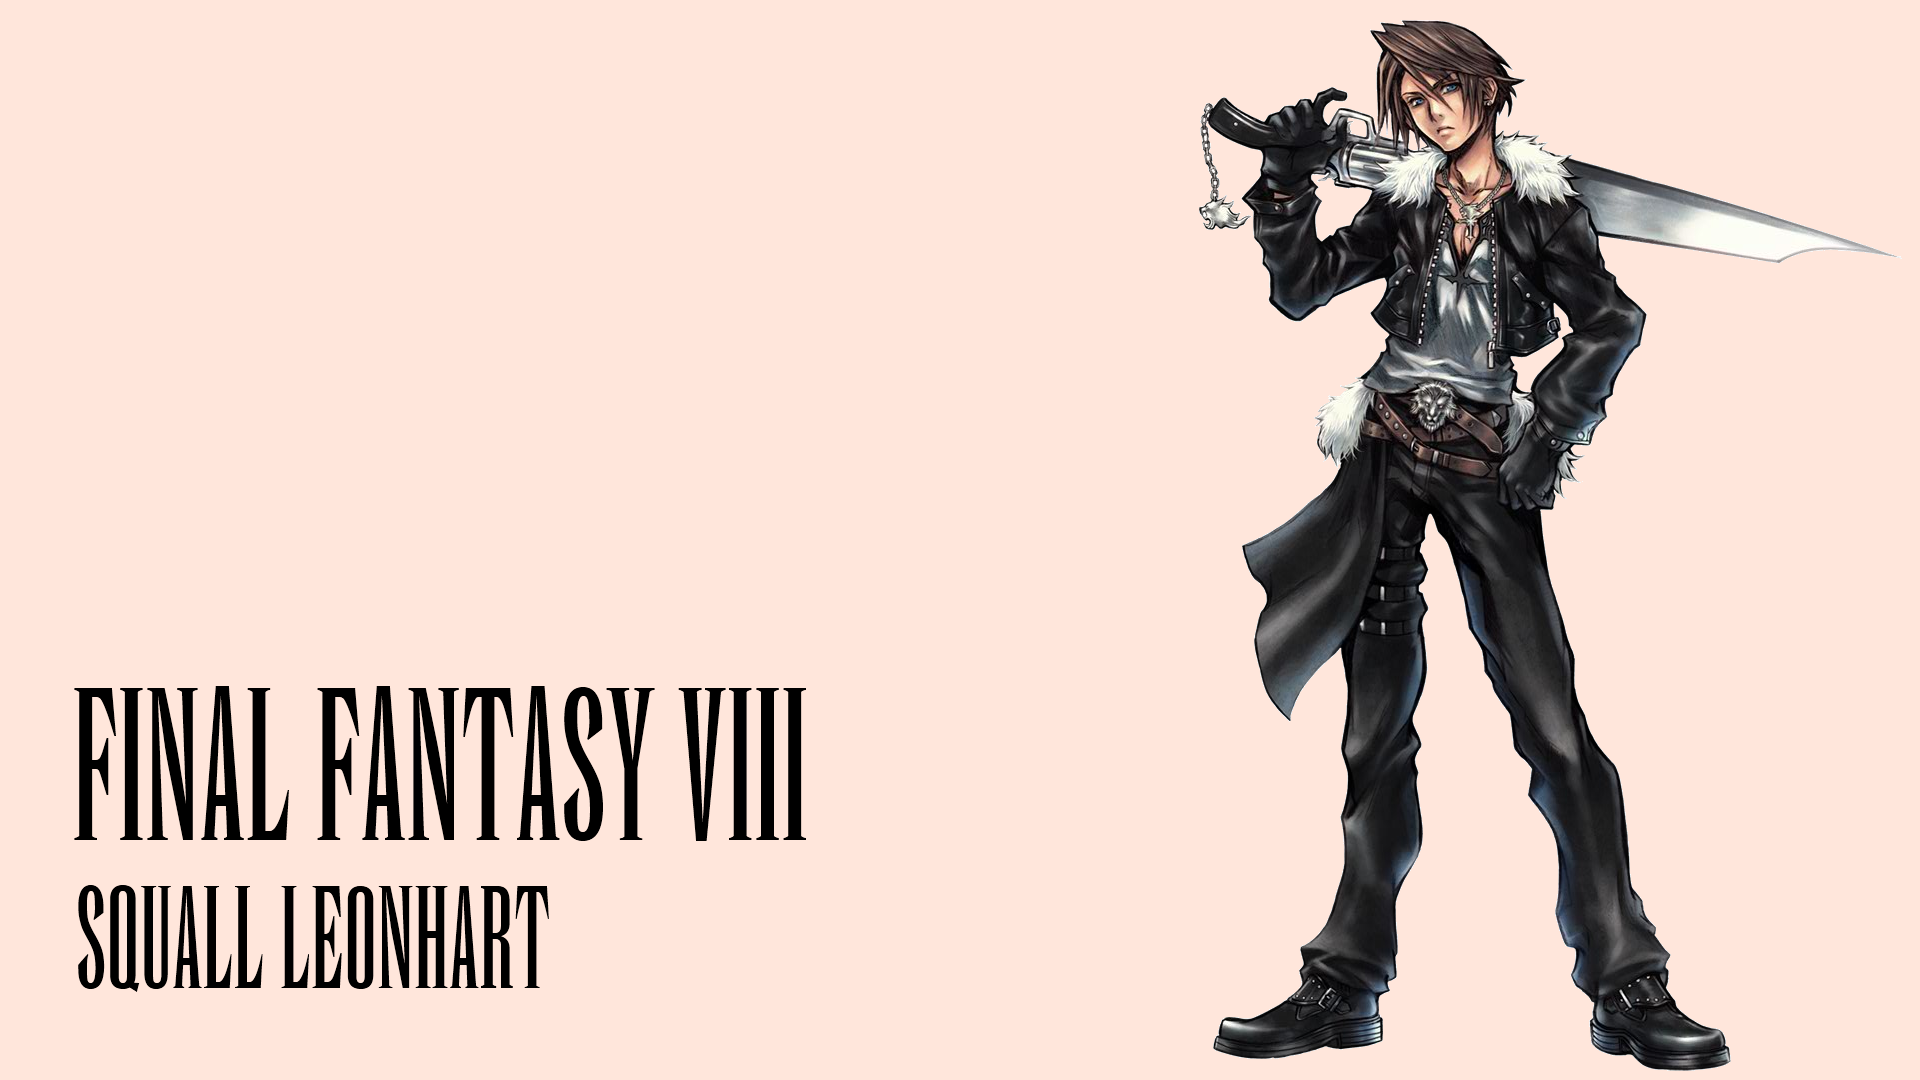 Final Fantasy 8 Wallpaper Final fantasy 1920x1080